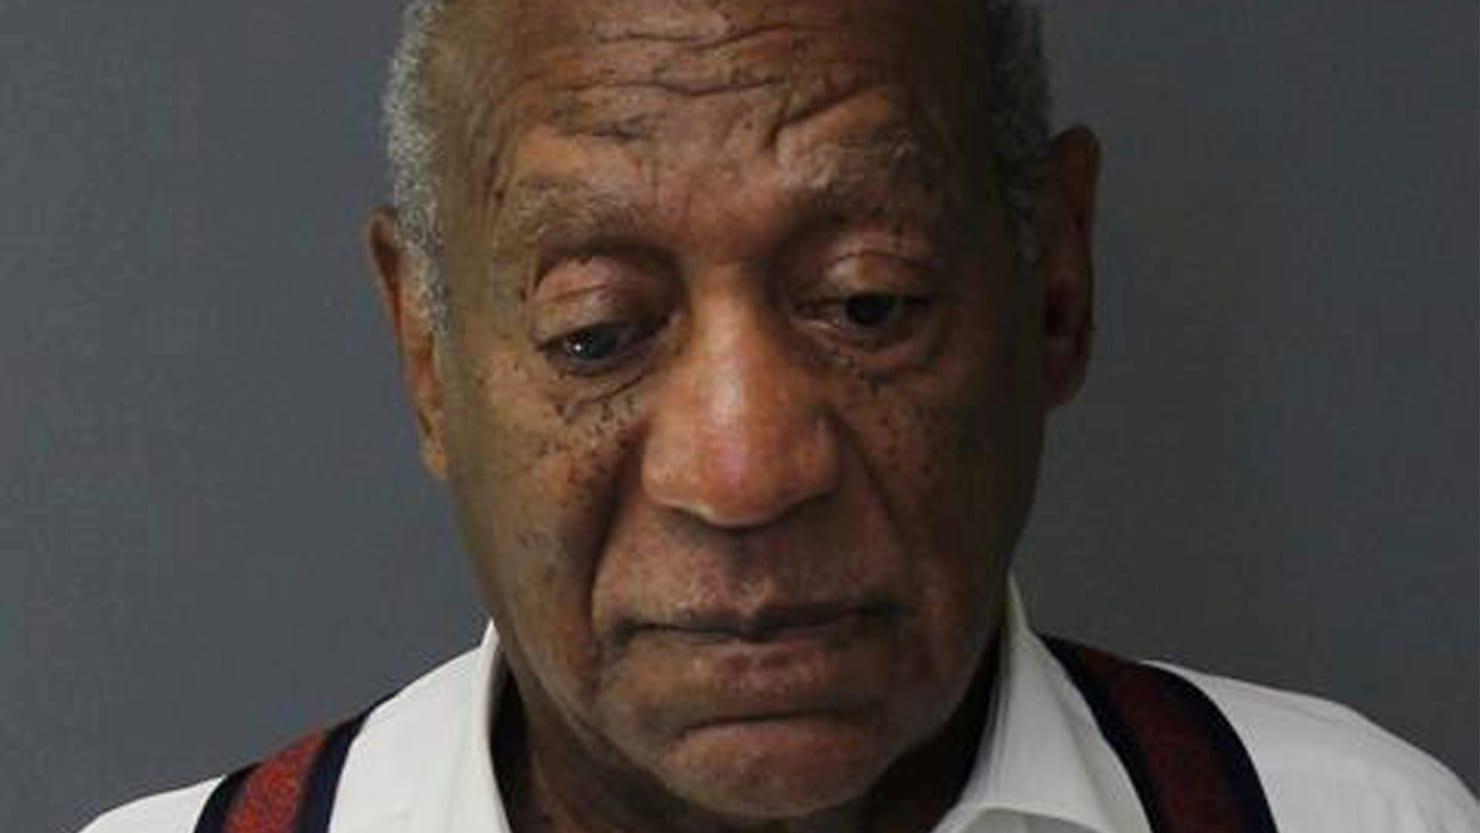 Bill Cosby Calls Himself a 'Political Prisoner,' Compares Himself to Ghandi, MLK